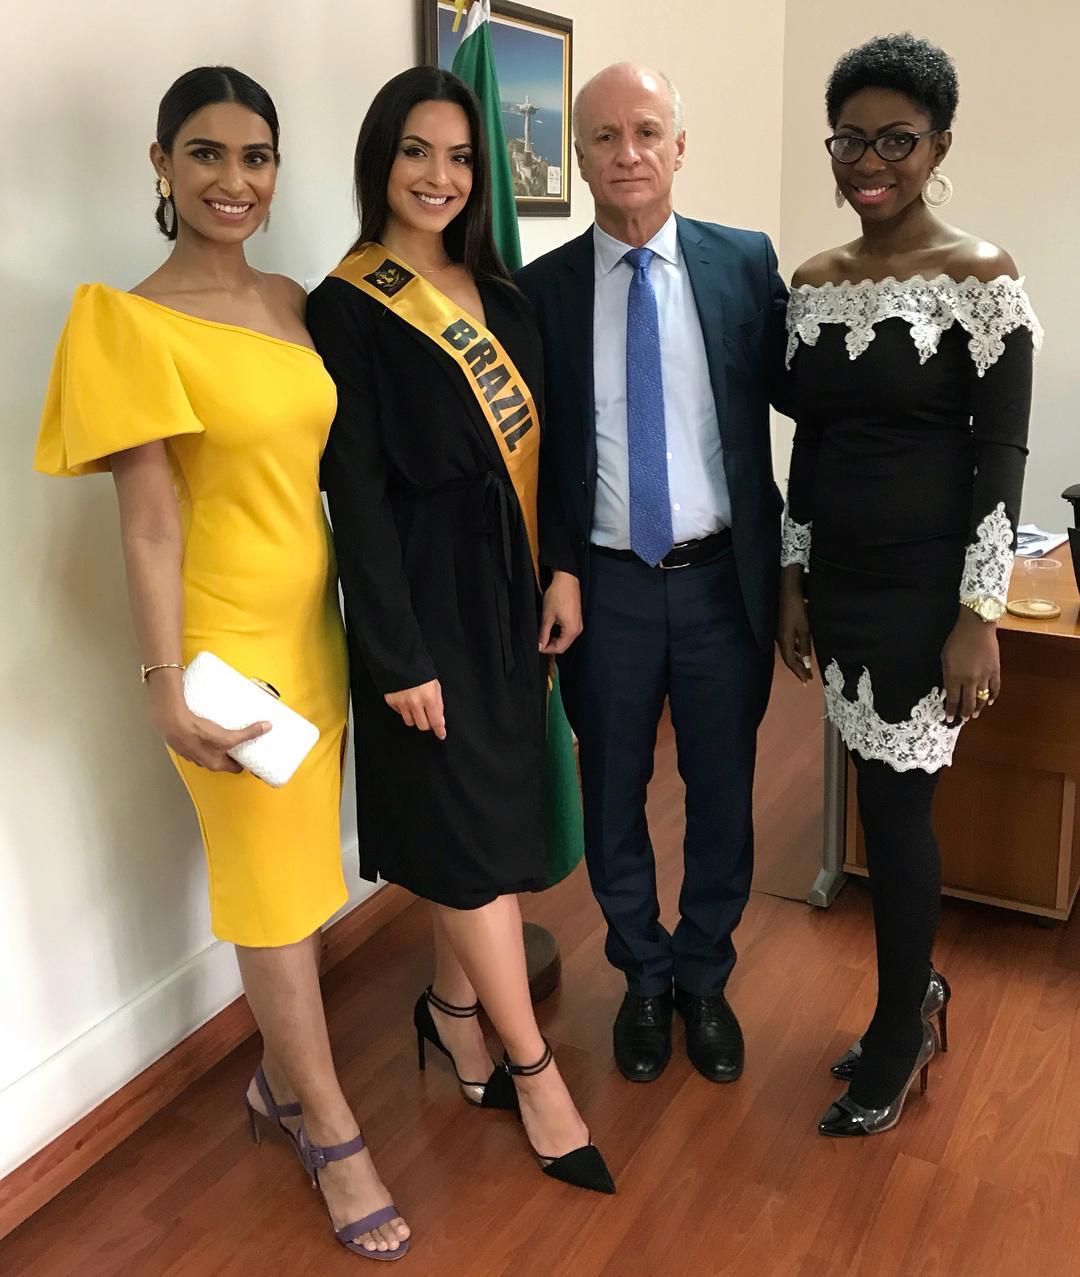 renata puppin, miss polo brasil 2018. - Página 3 39763910